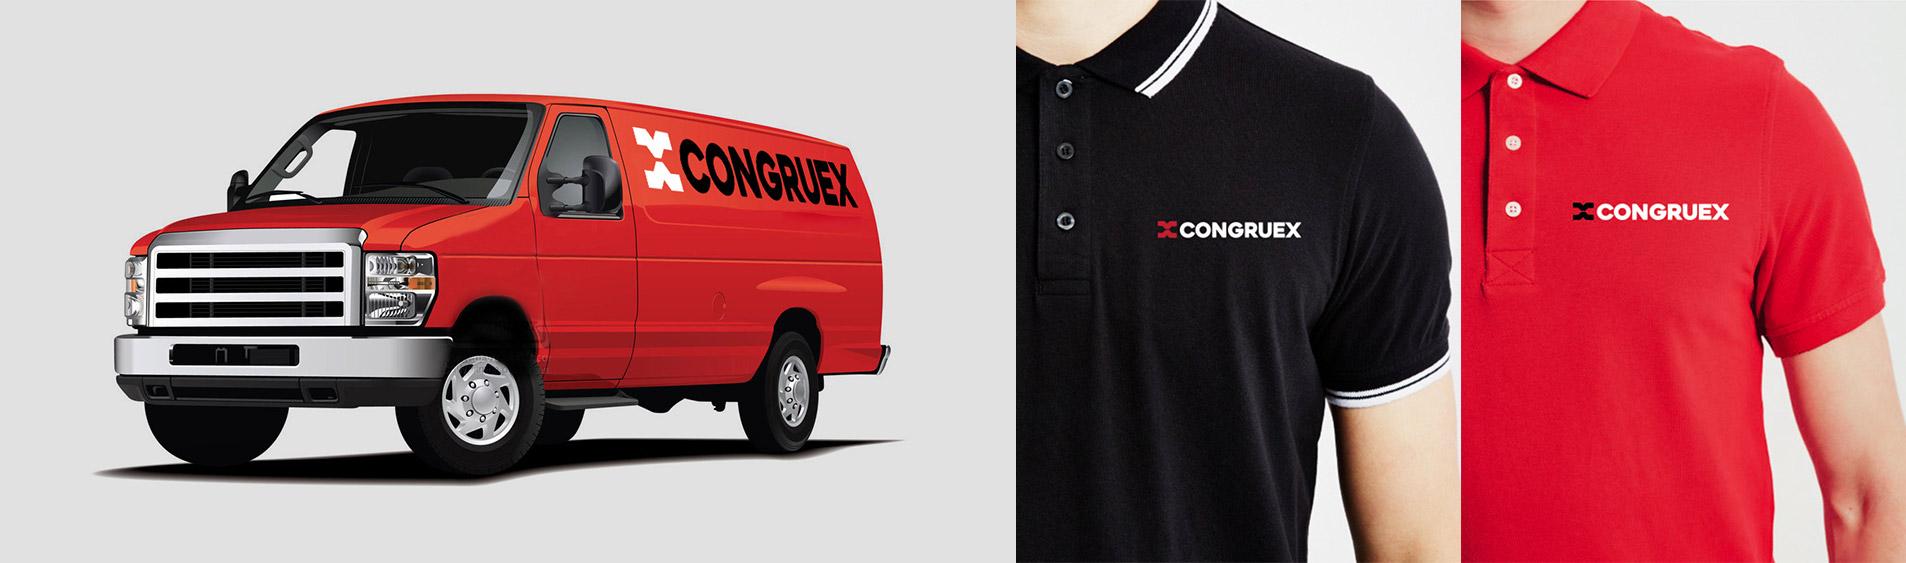 branding on van and shirts